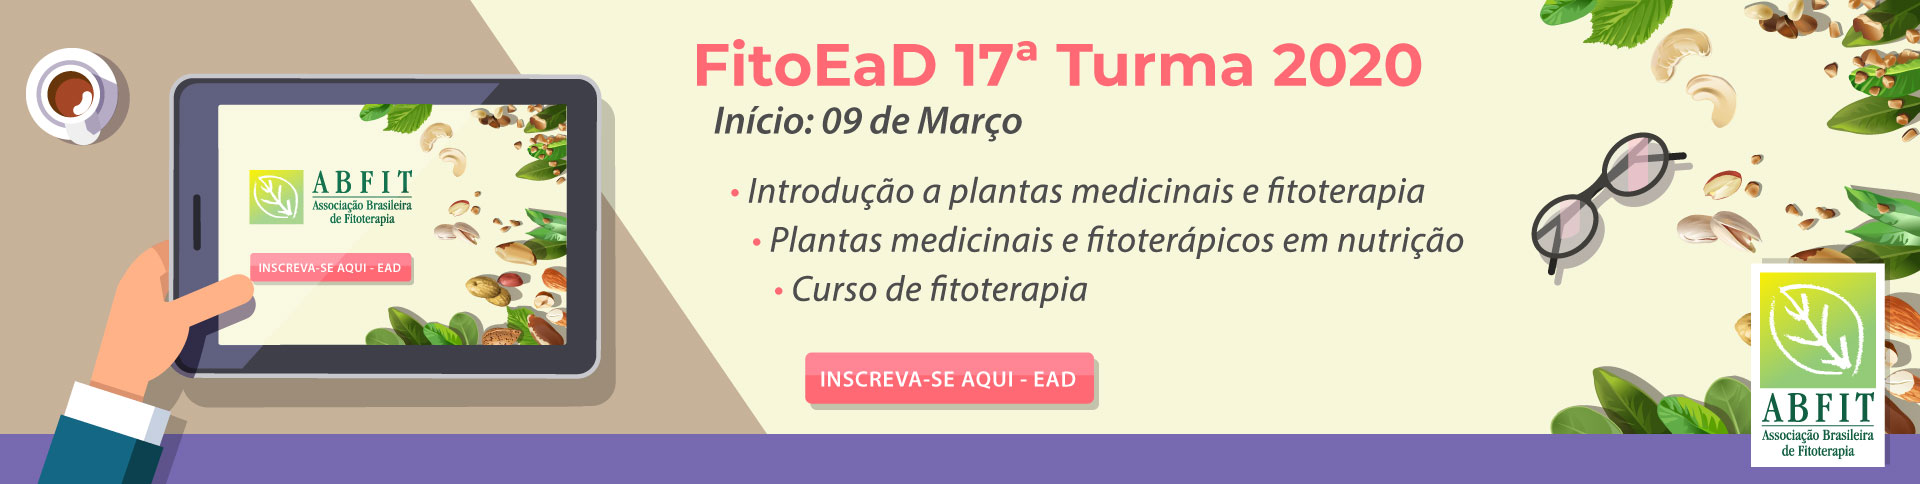 banner-post-fitoead-17a-turma-2020-03-1920x484-191008.jpg